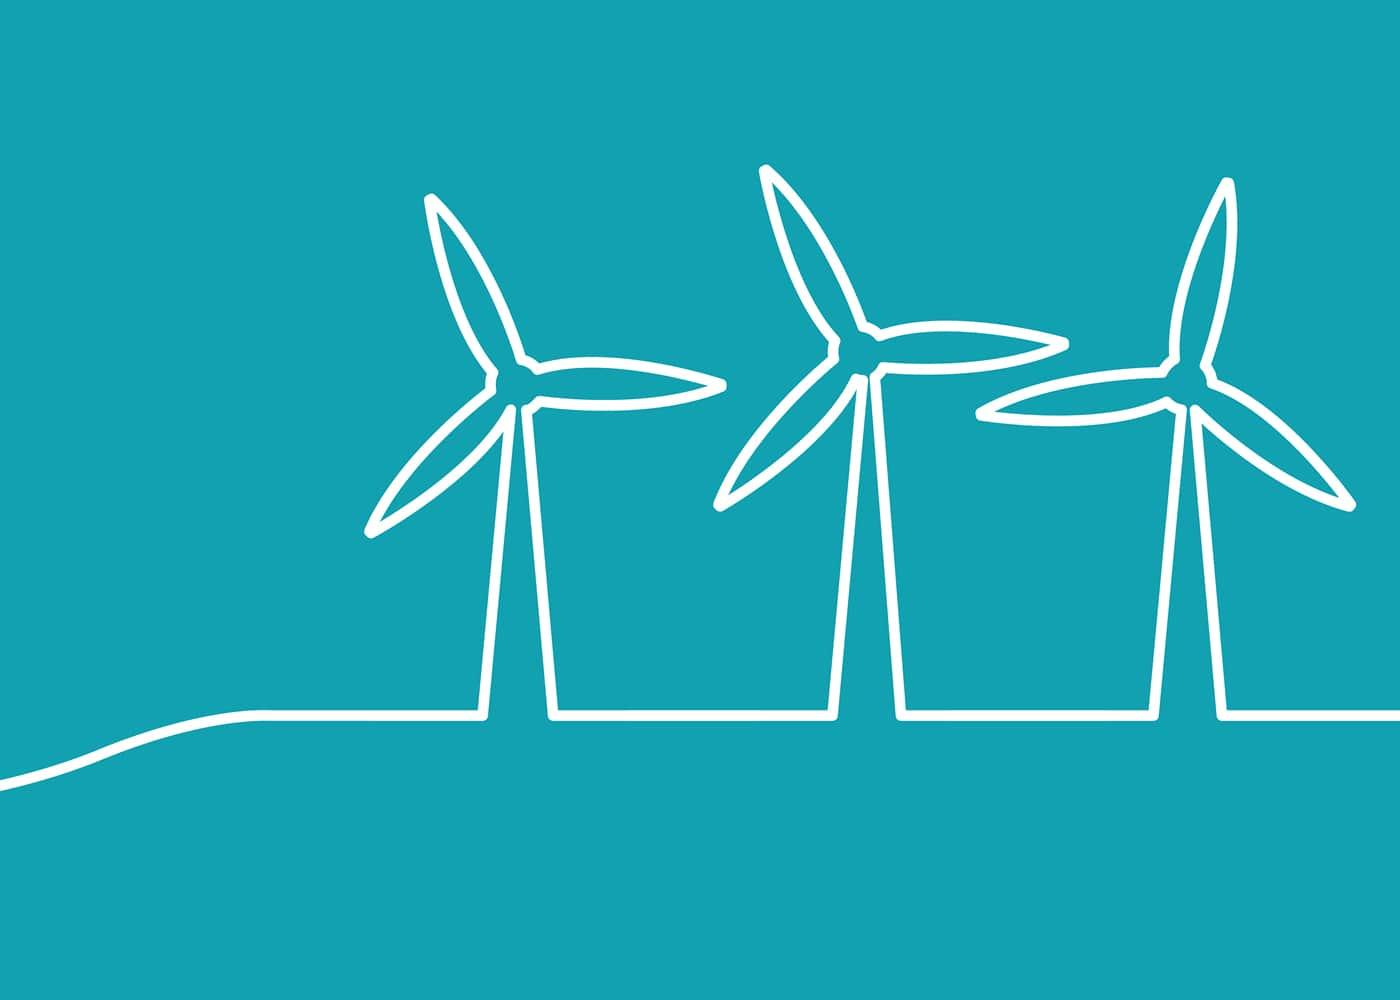 naem-research-quickpolls-2016-07-renewable-energy-strategies-700x500